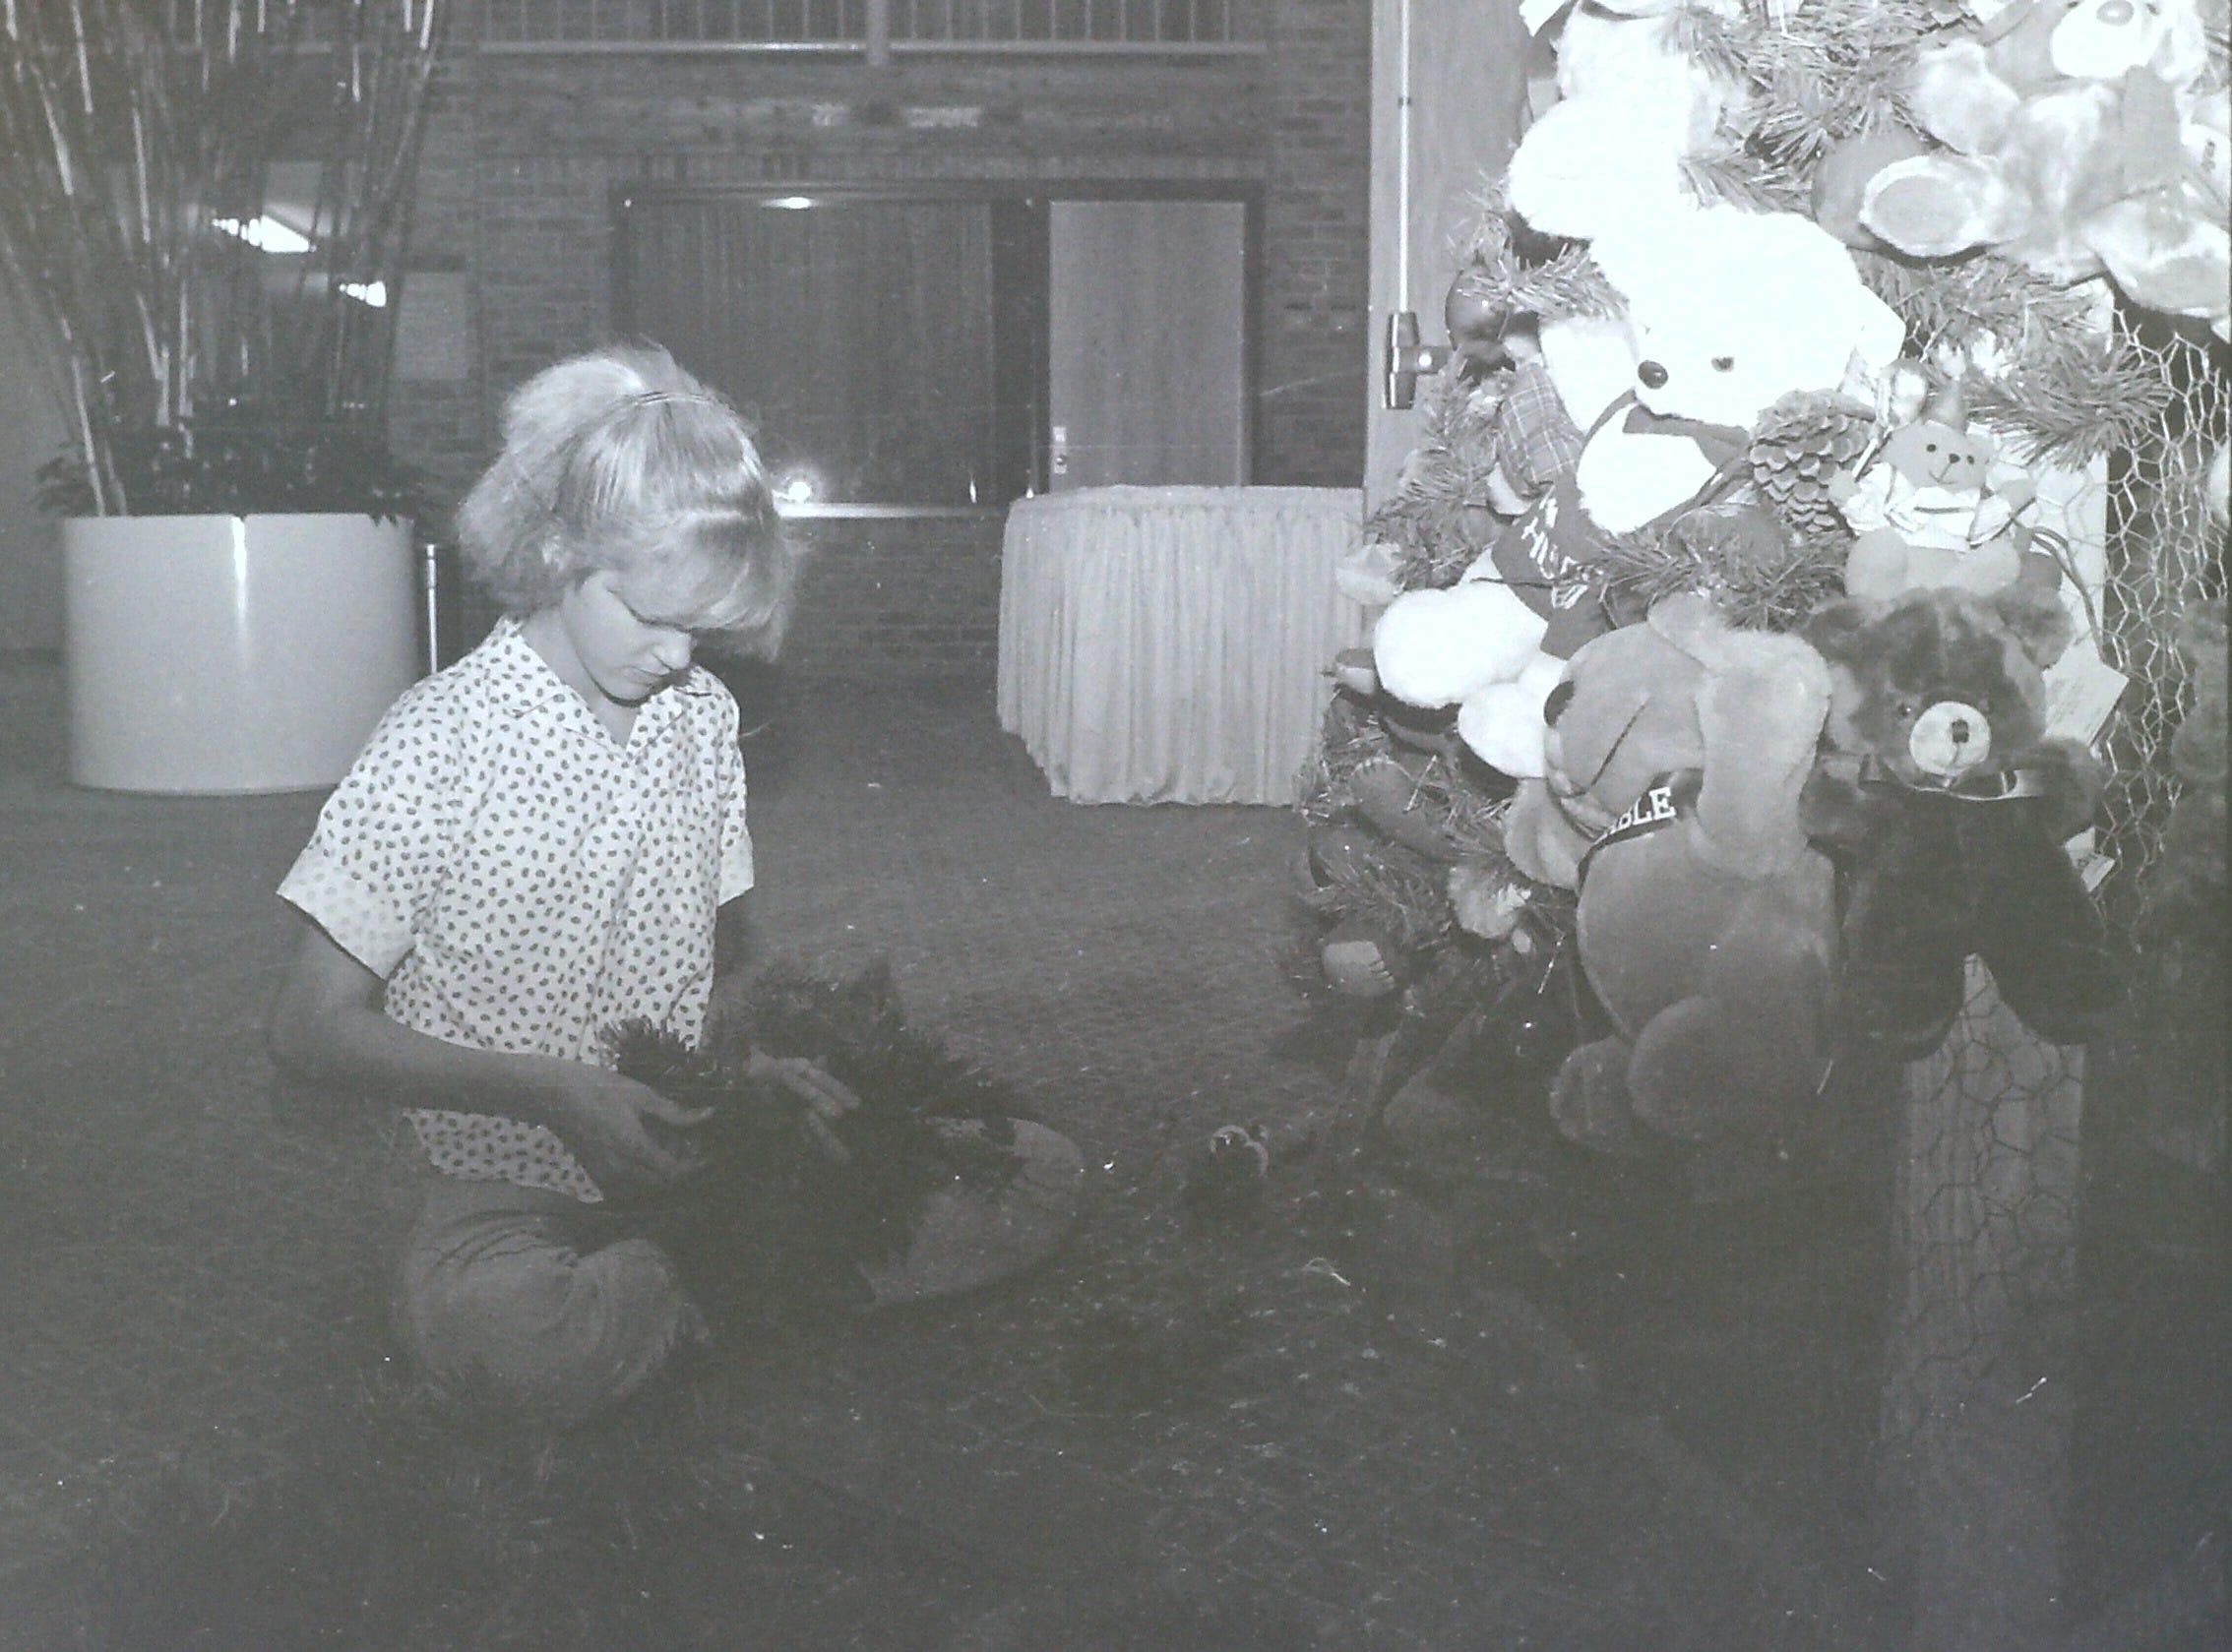 Tree designers prepare for the Jubilee of Trees circa 1985.